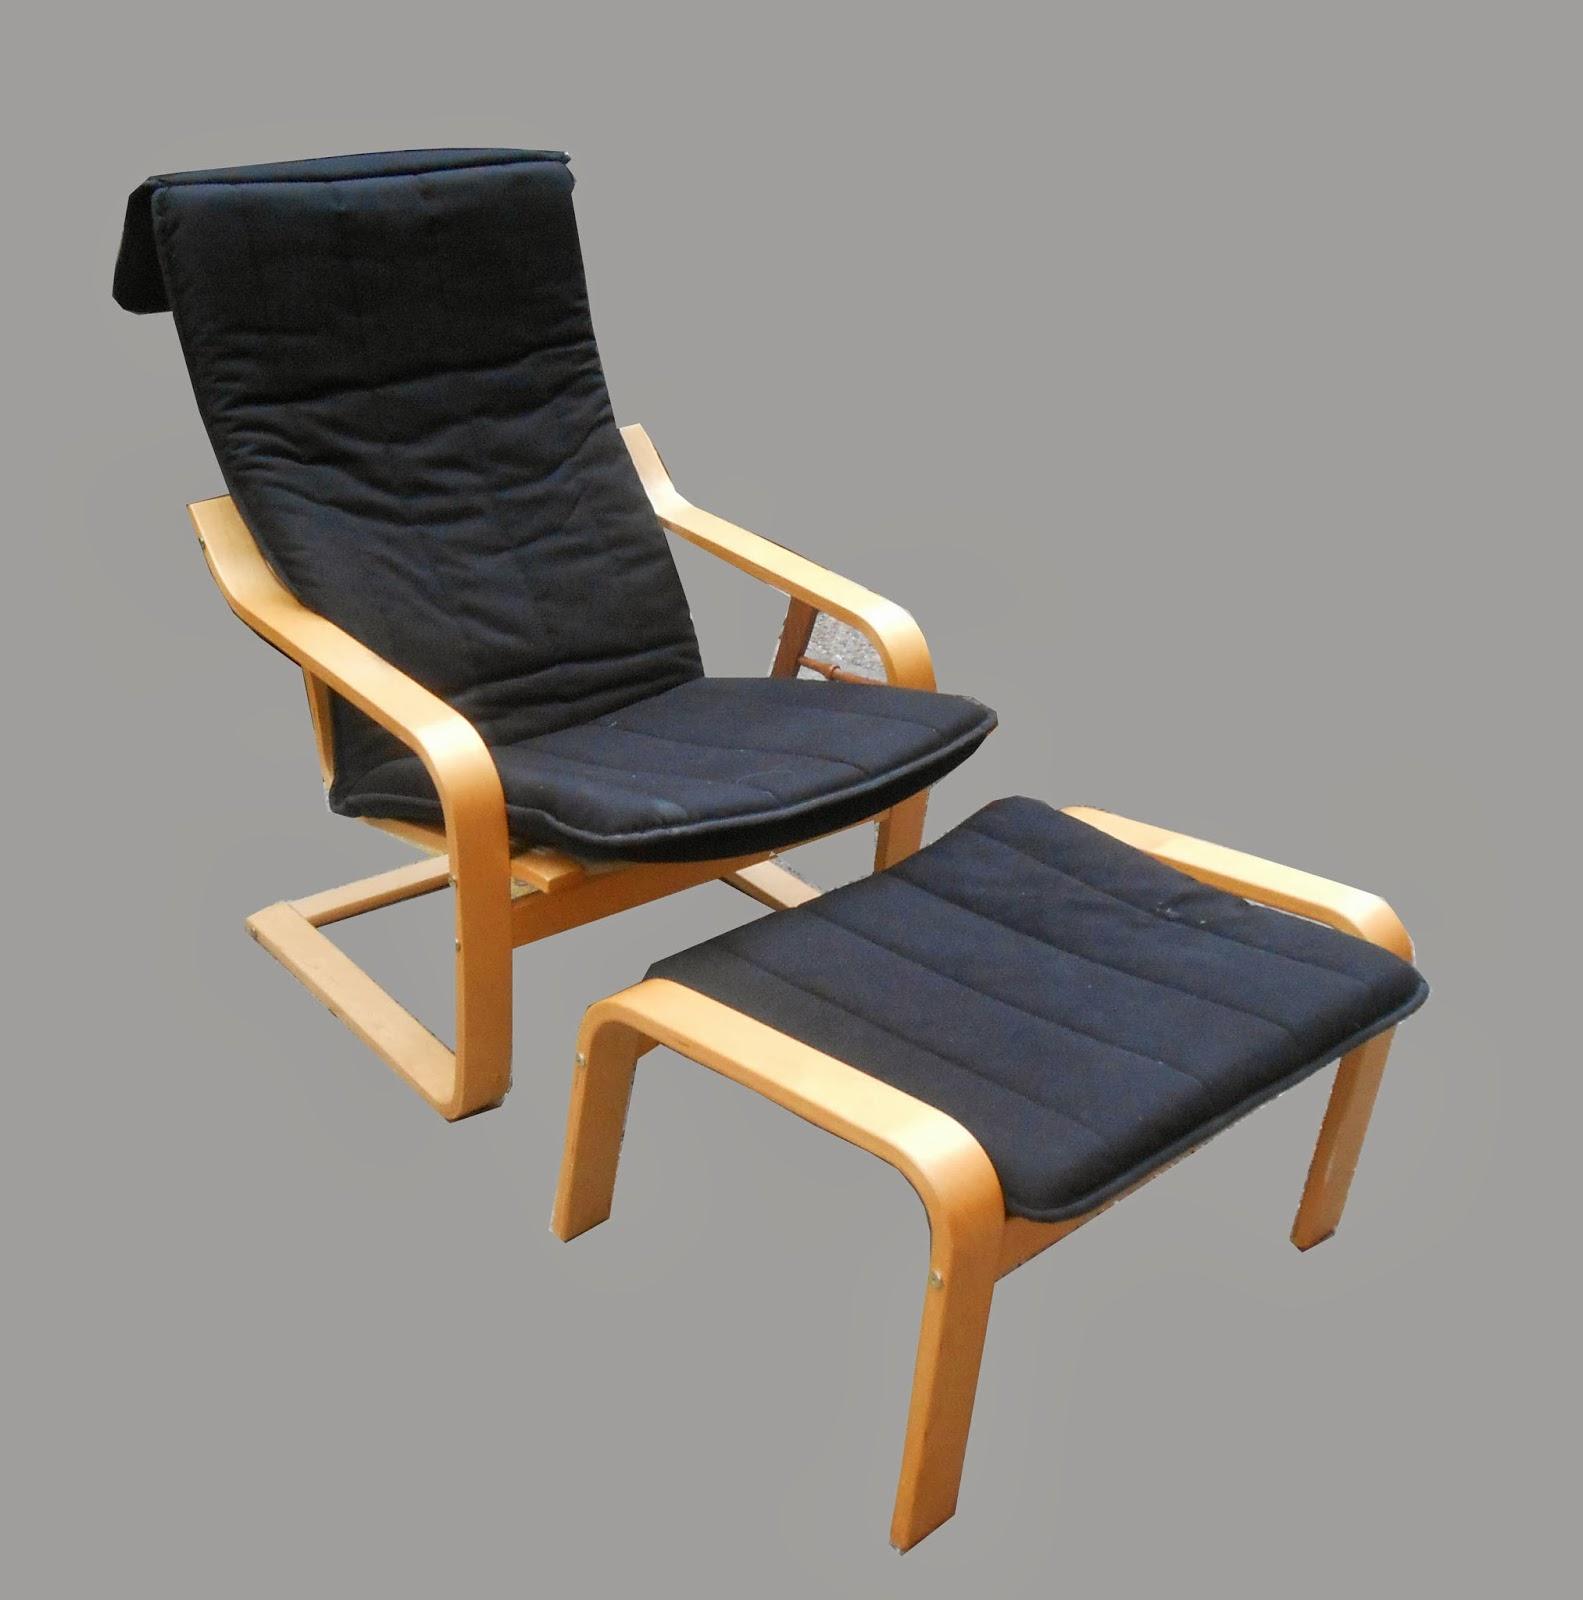 Uhuru Furniture & Collectibles: Ikea Poang Lounge Chair